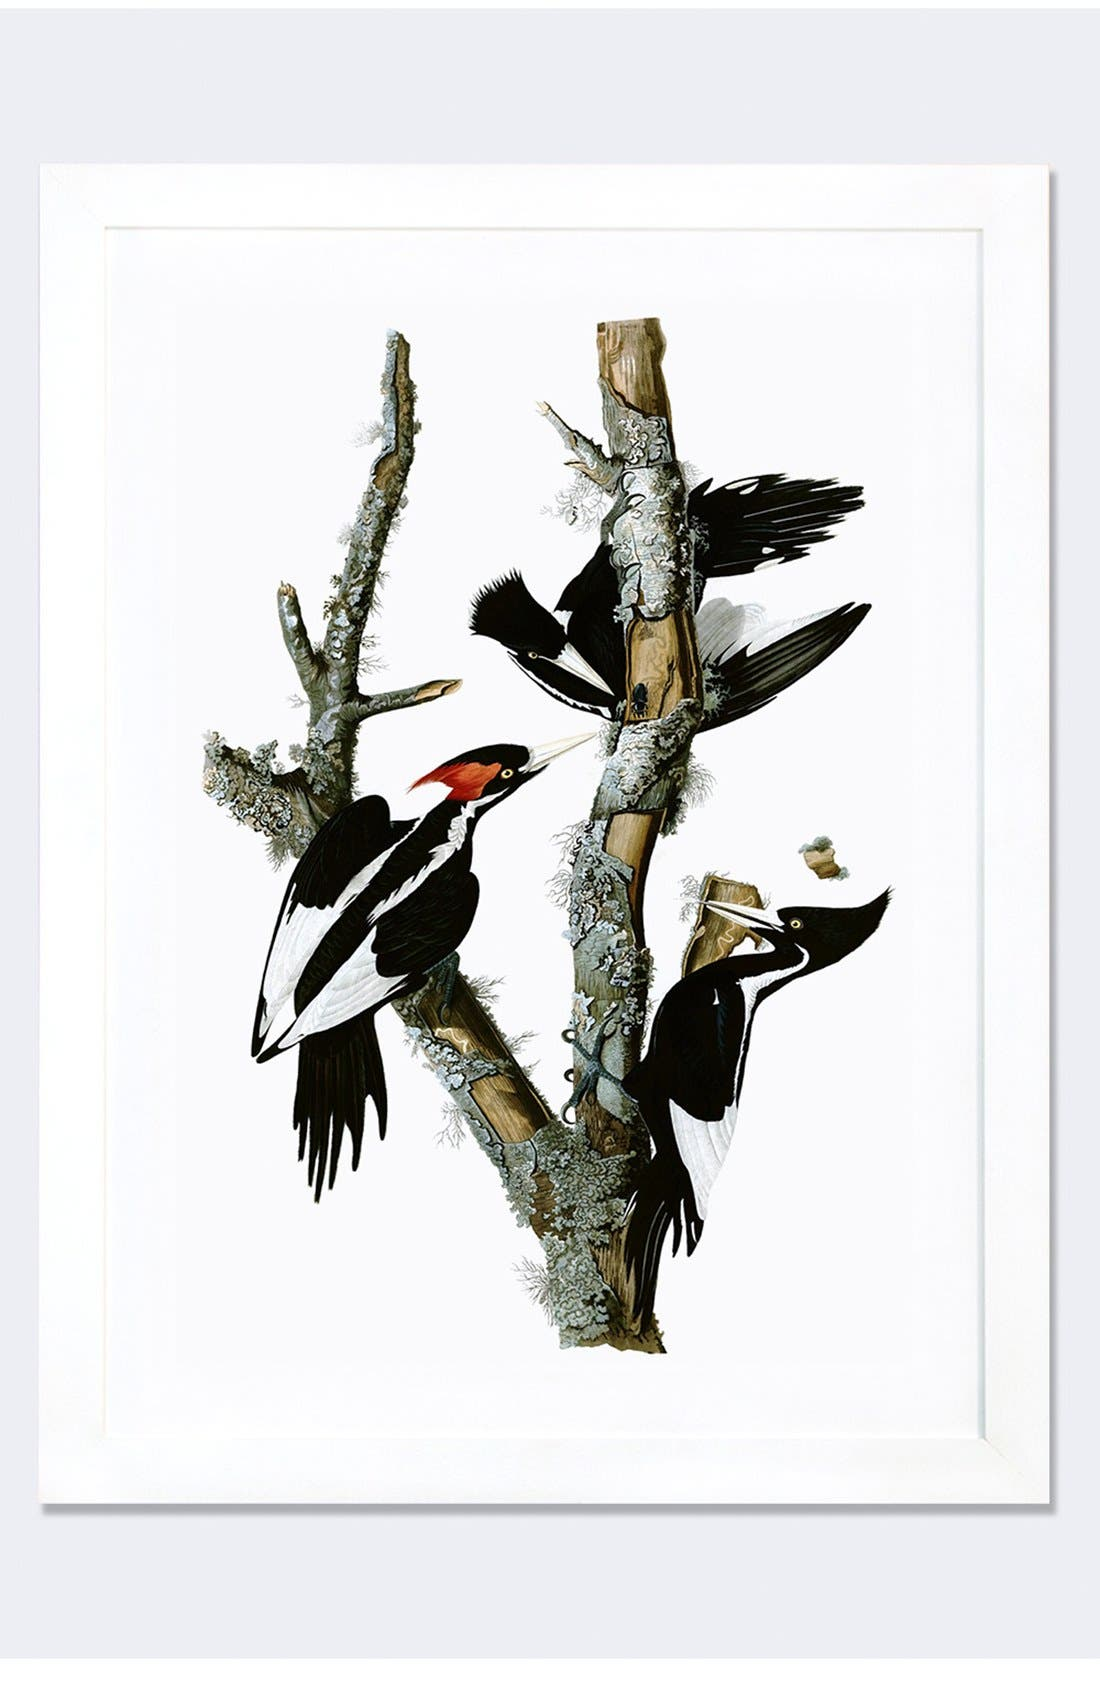 'Ivory Billed Woodpecker' Framed Fine Art Print,                         Main,                         color, WHITE